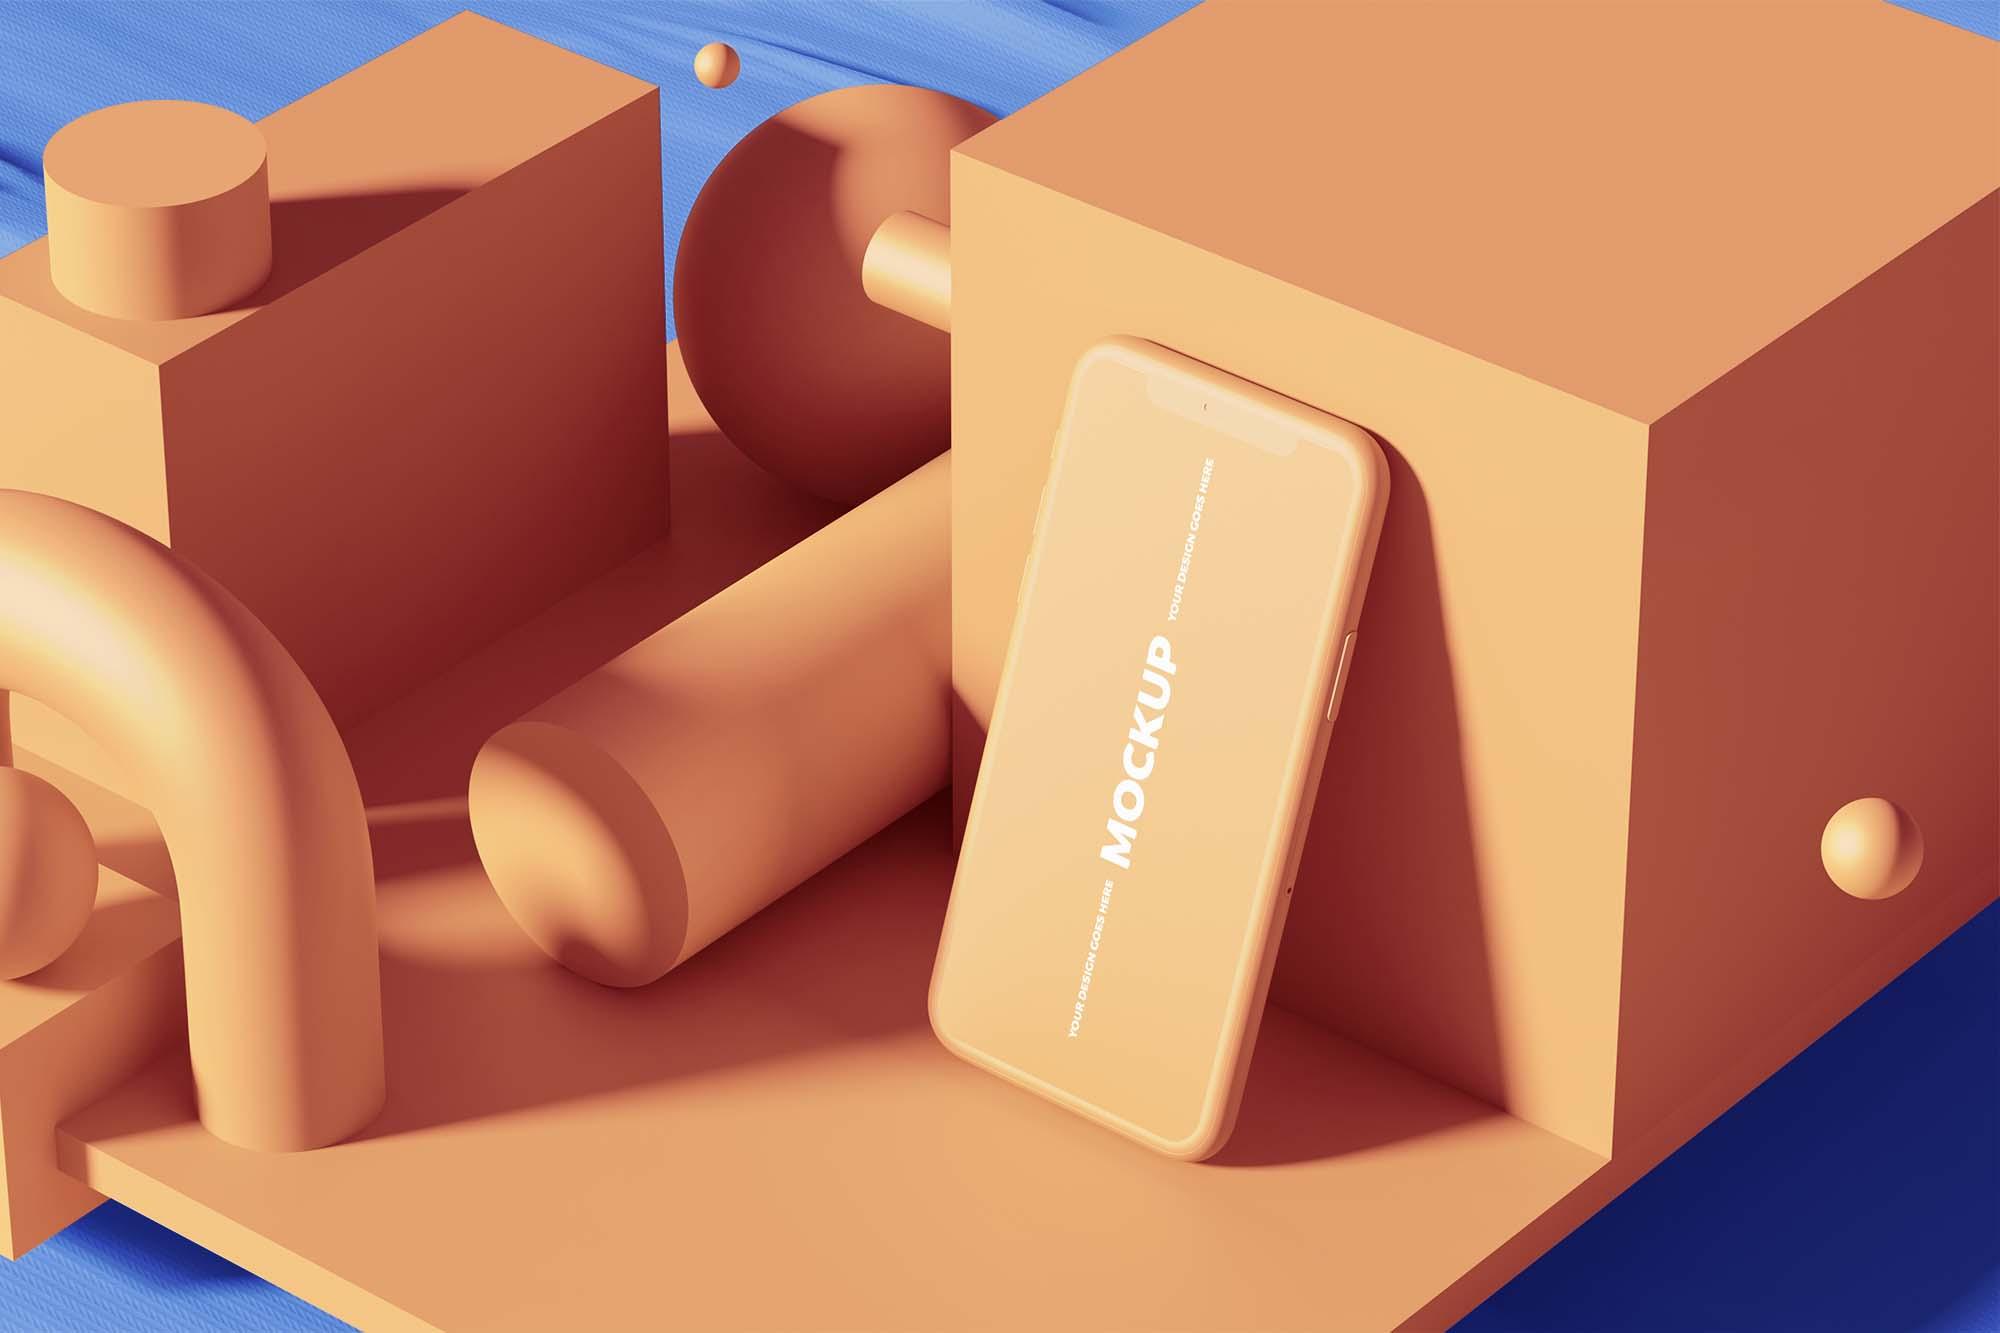 iPhone 11 3D Mockup